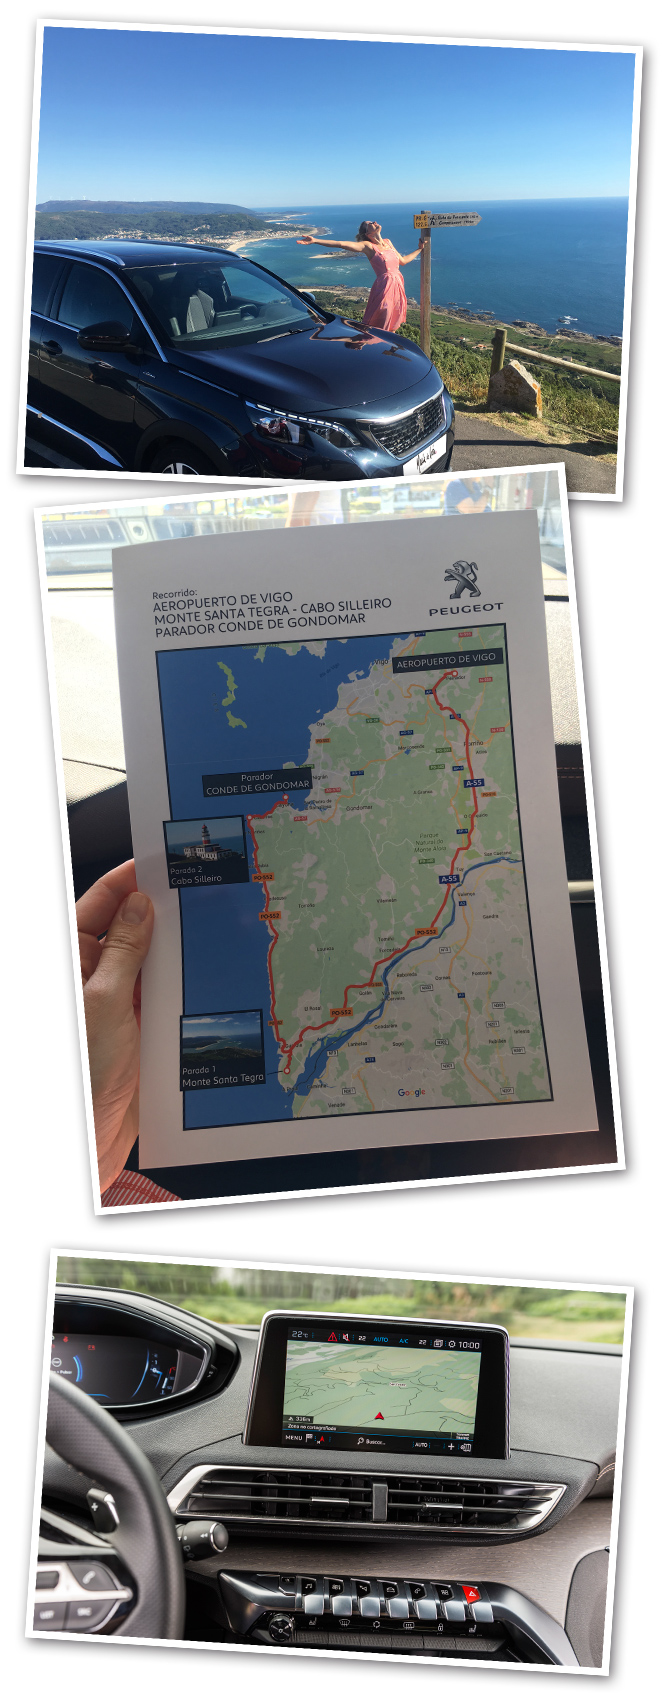 Escapada a Galicia e Islas Cíes